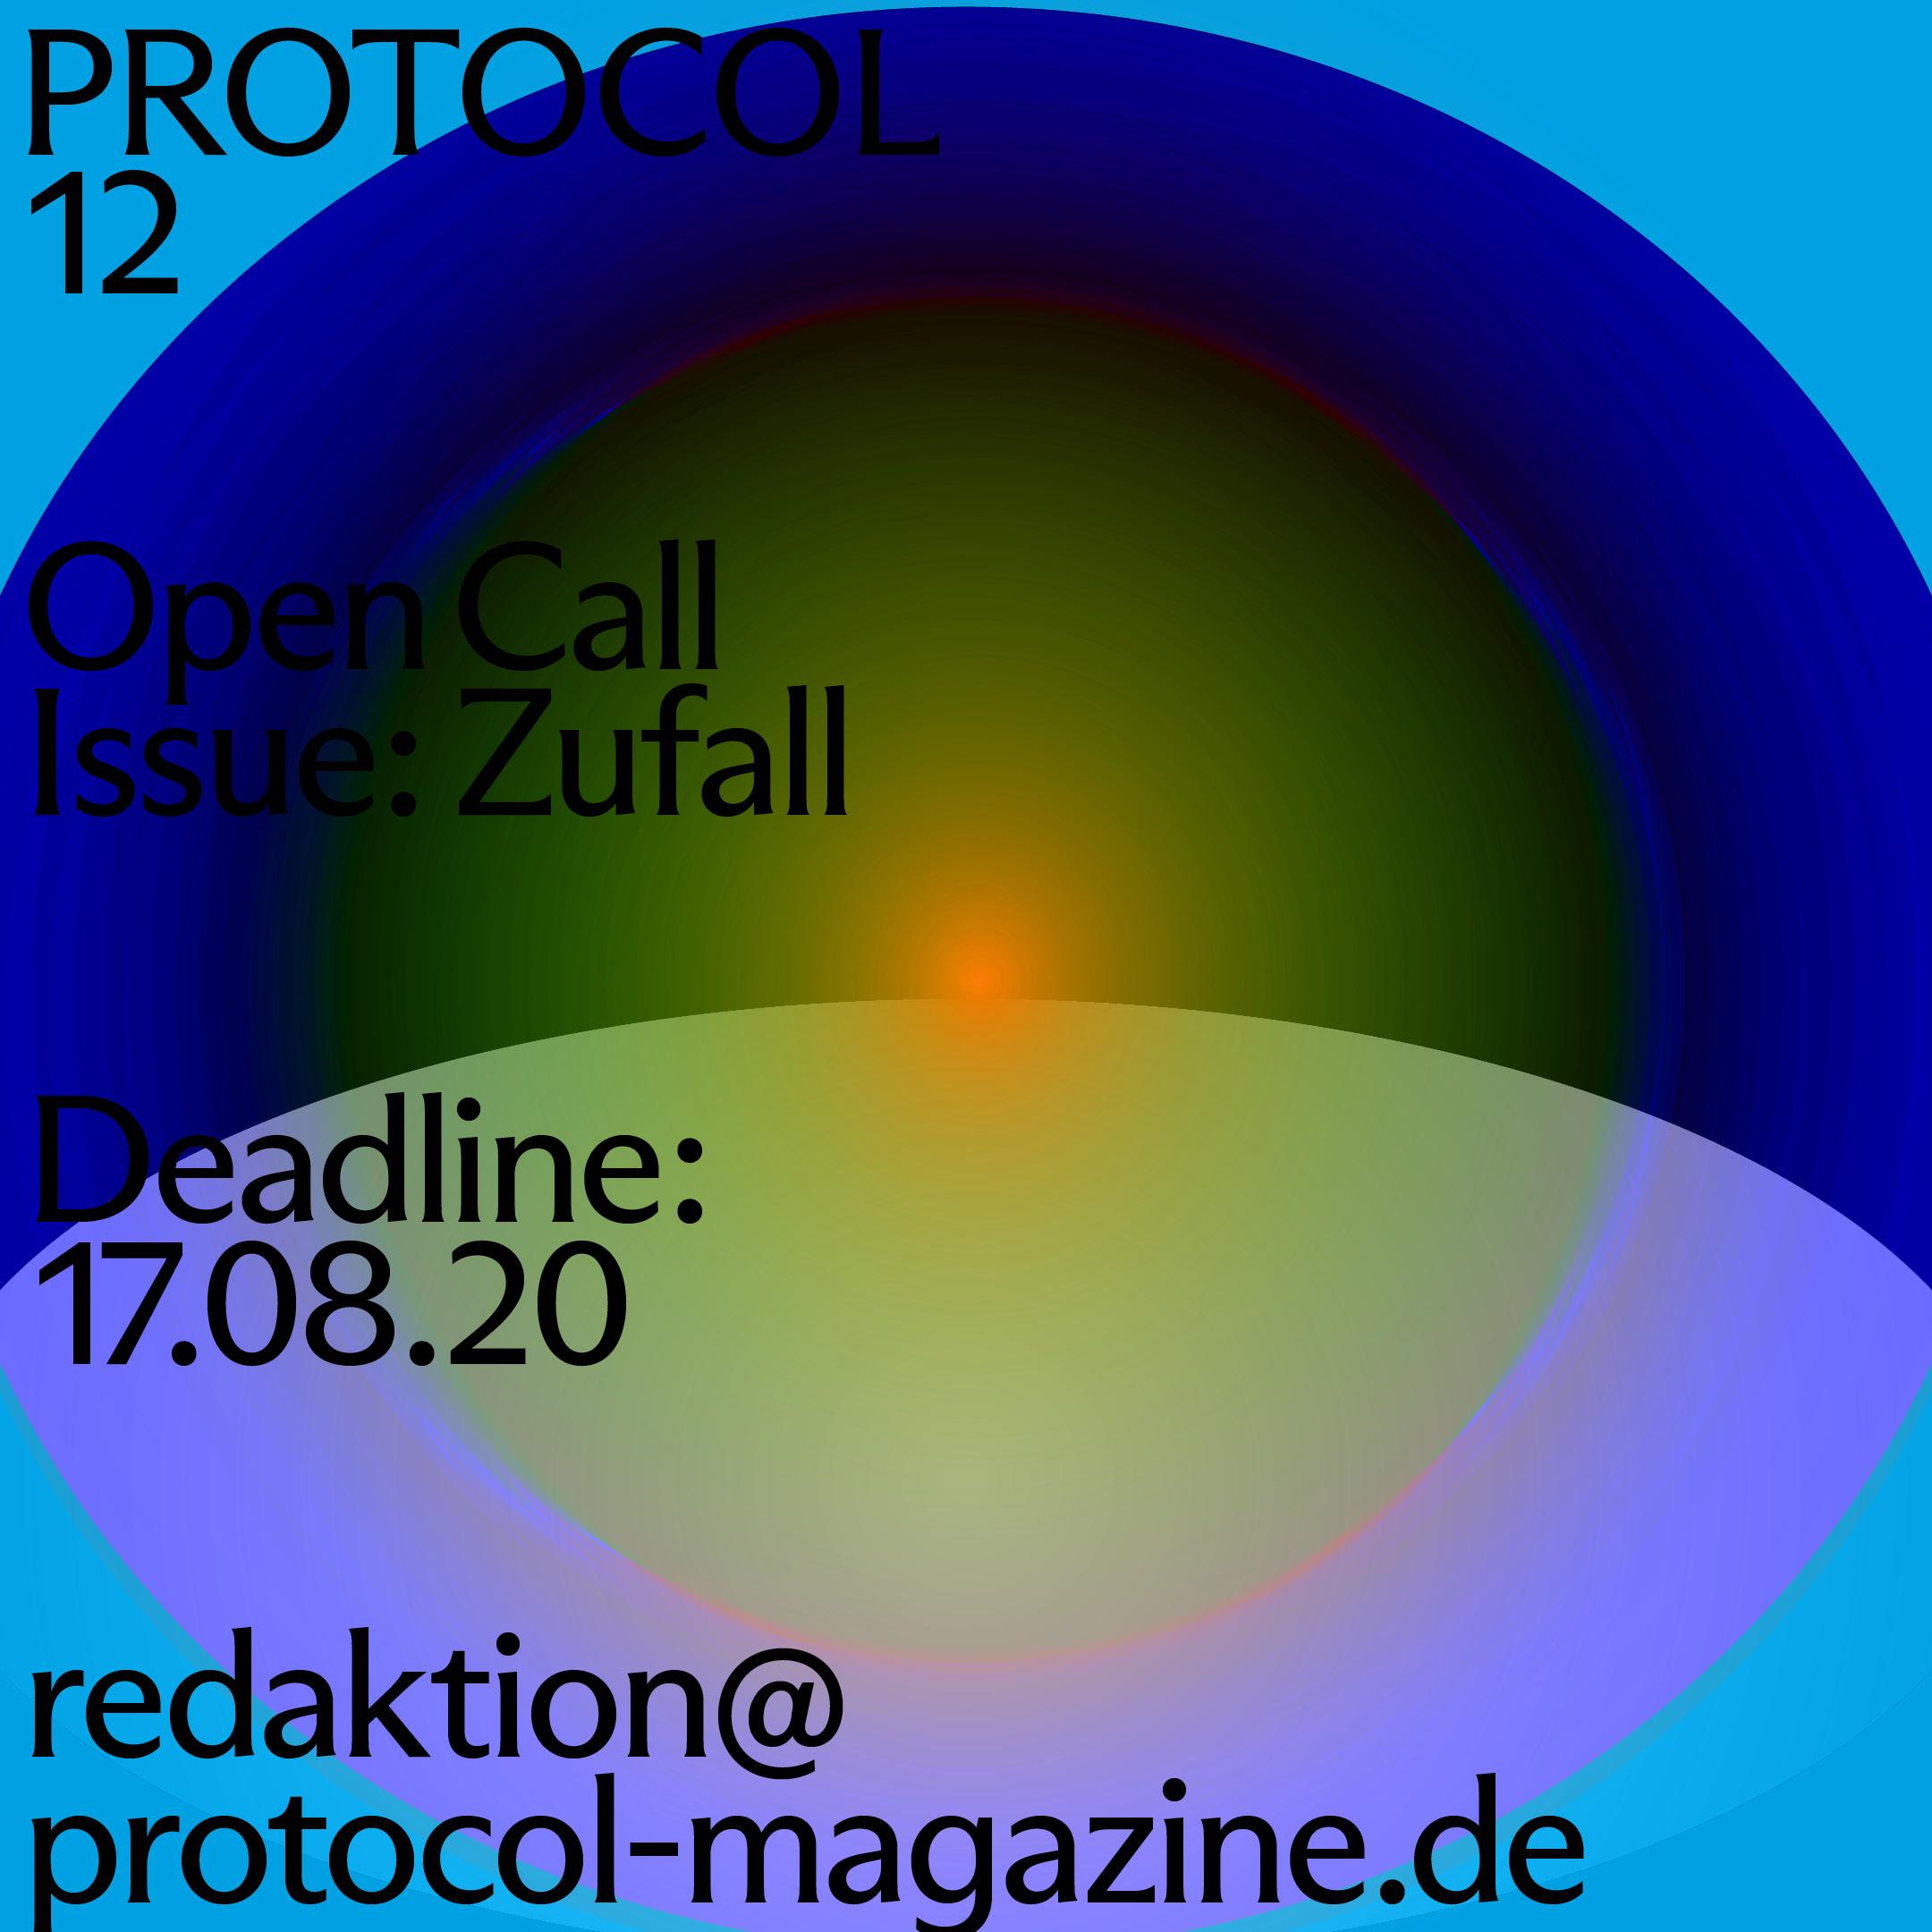 p12_Instagram-Redaktion_Protocol-Magazin_Magazin-fuer-Architektur-im-Kontext10